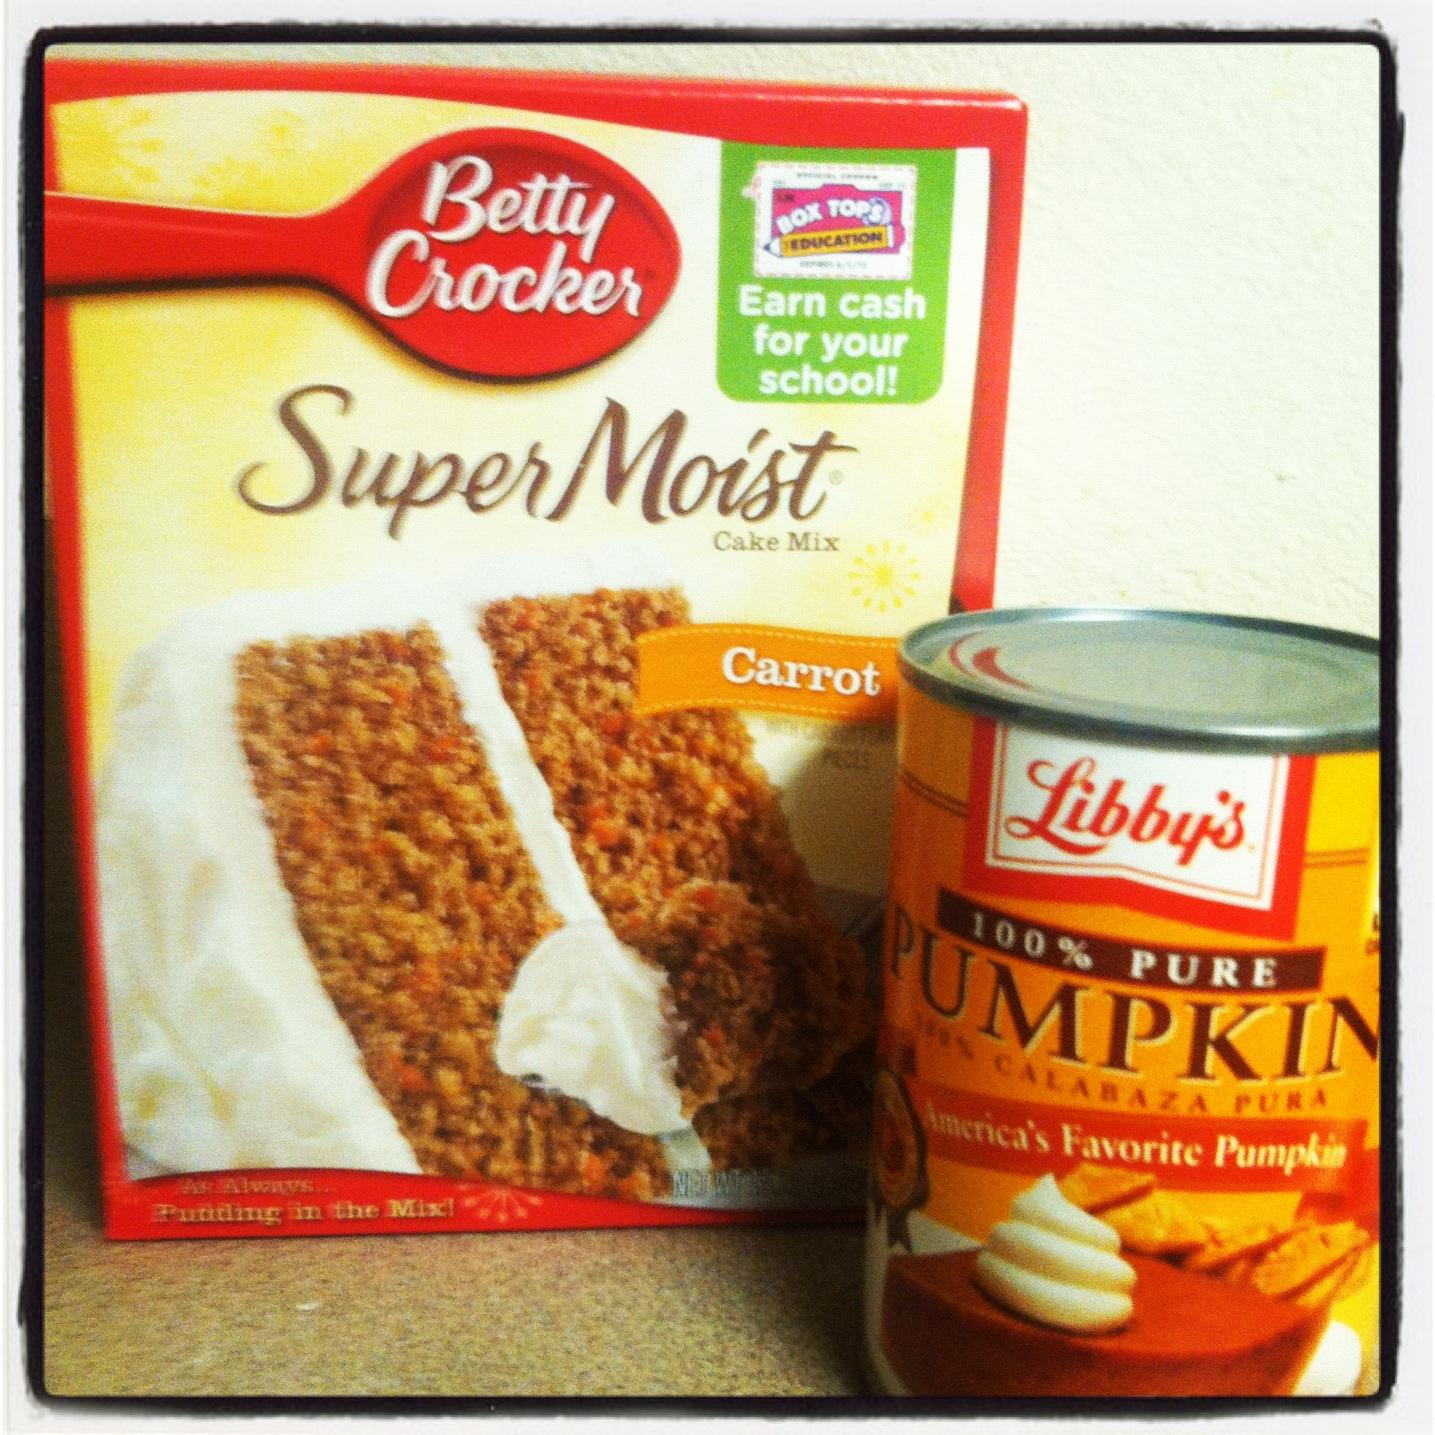 Kooking With Kari Skinny Carrot Cake Cupcakes With Cream